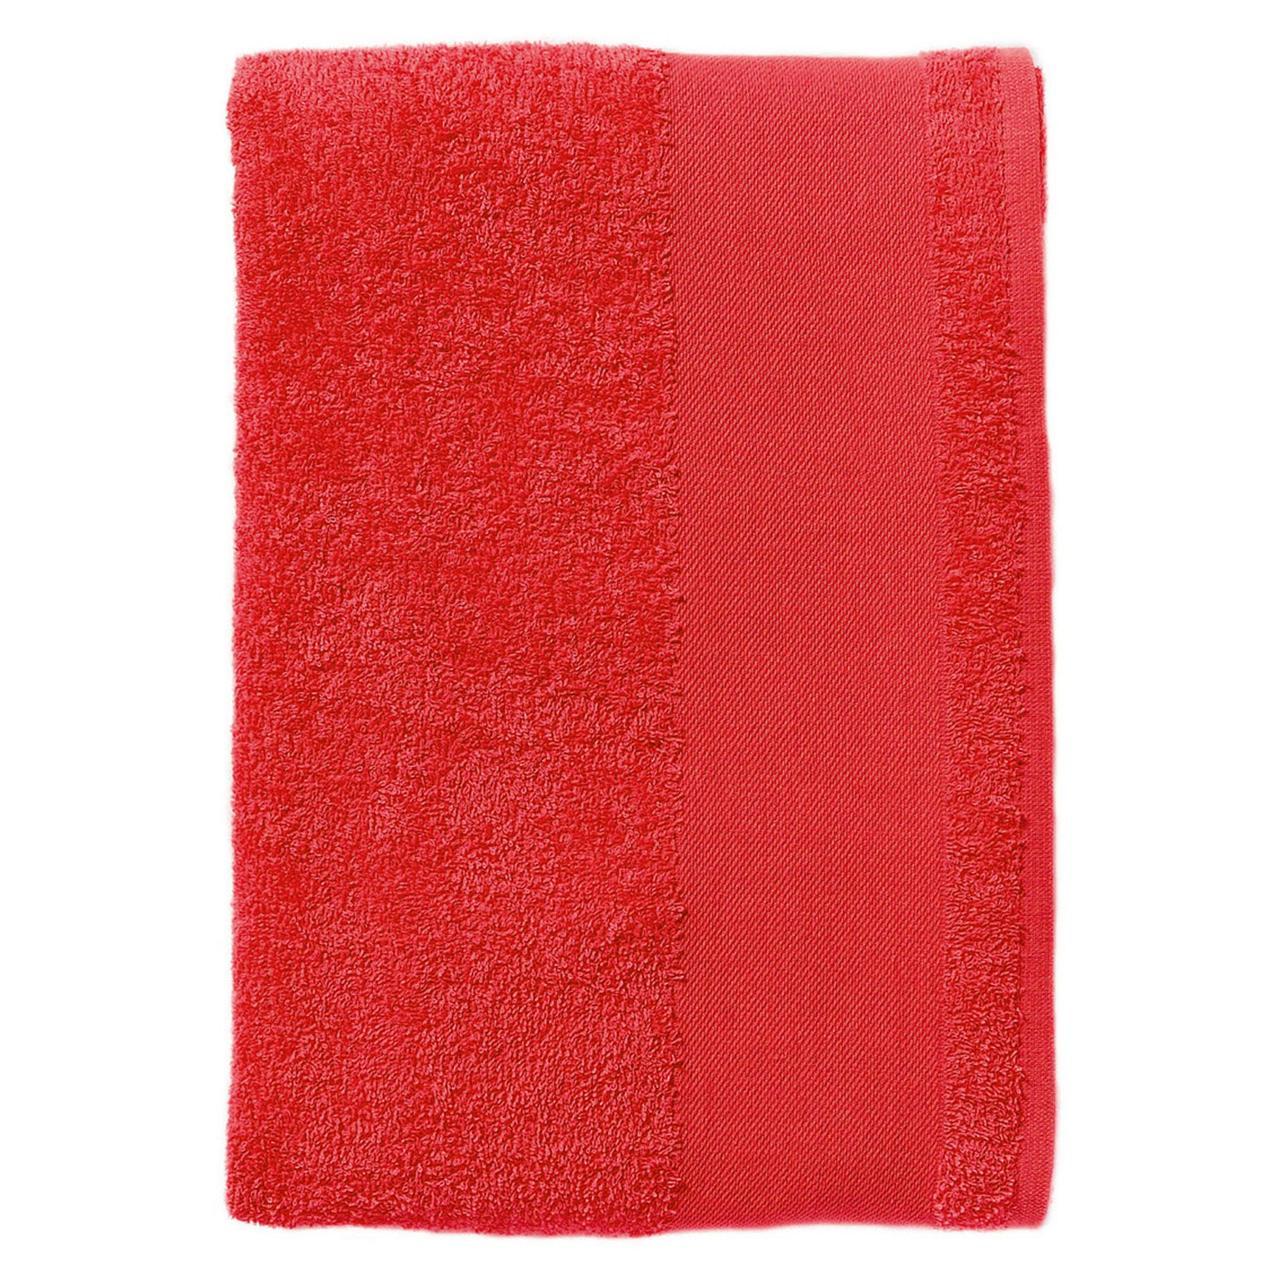 Полотенце махровое Island Medium, красное (артикул 4592.50)